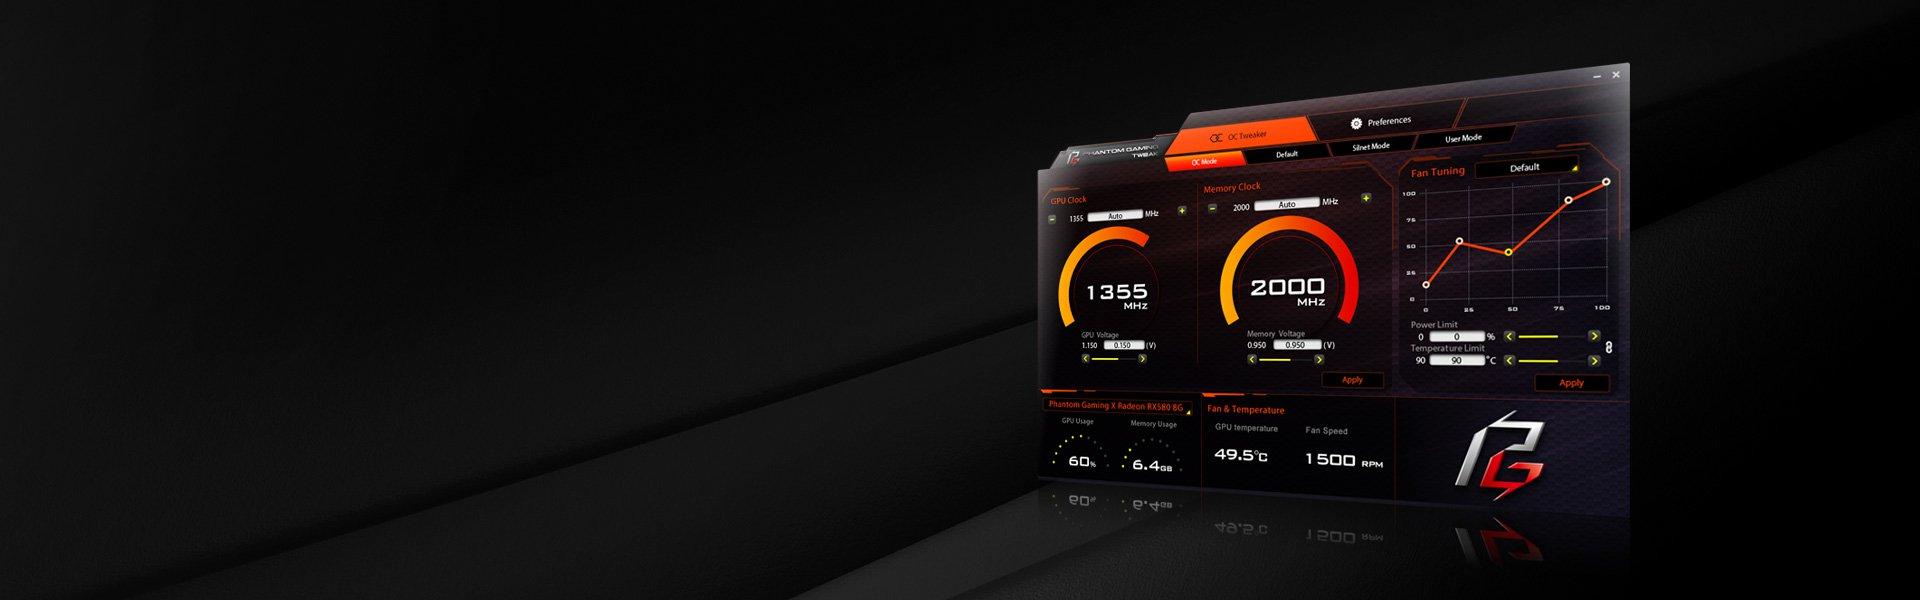 ASRock > Phantom Gaming Radeon RX560 2G